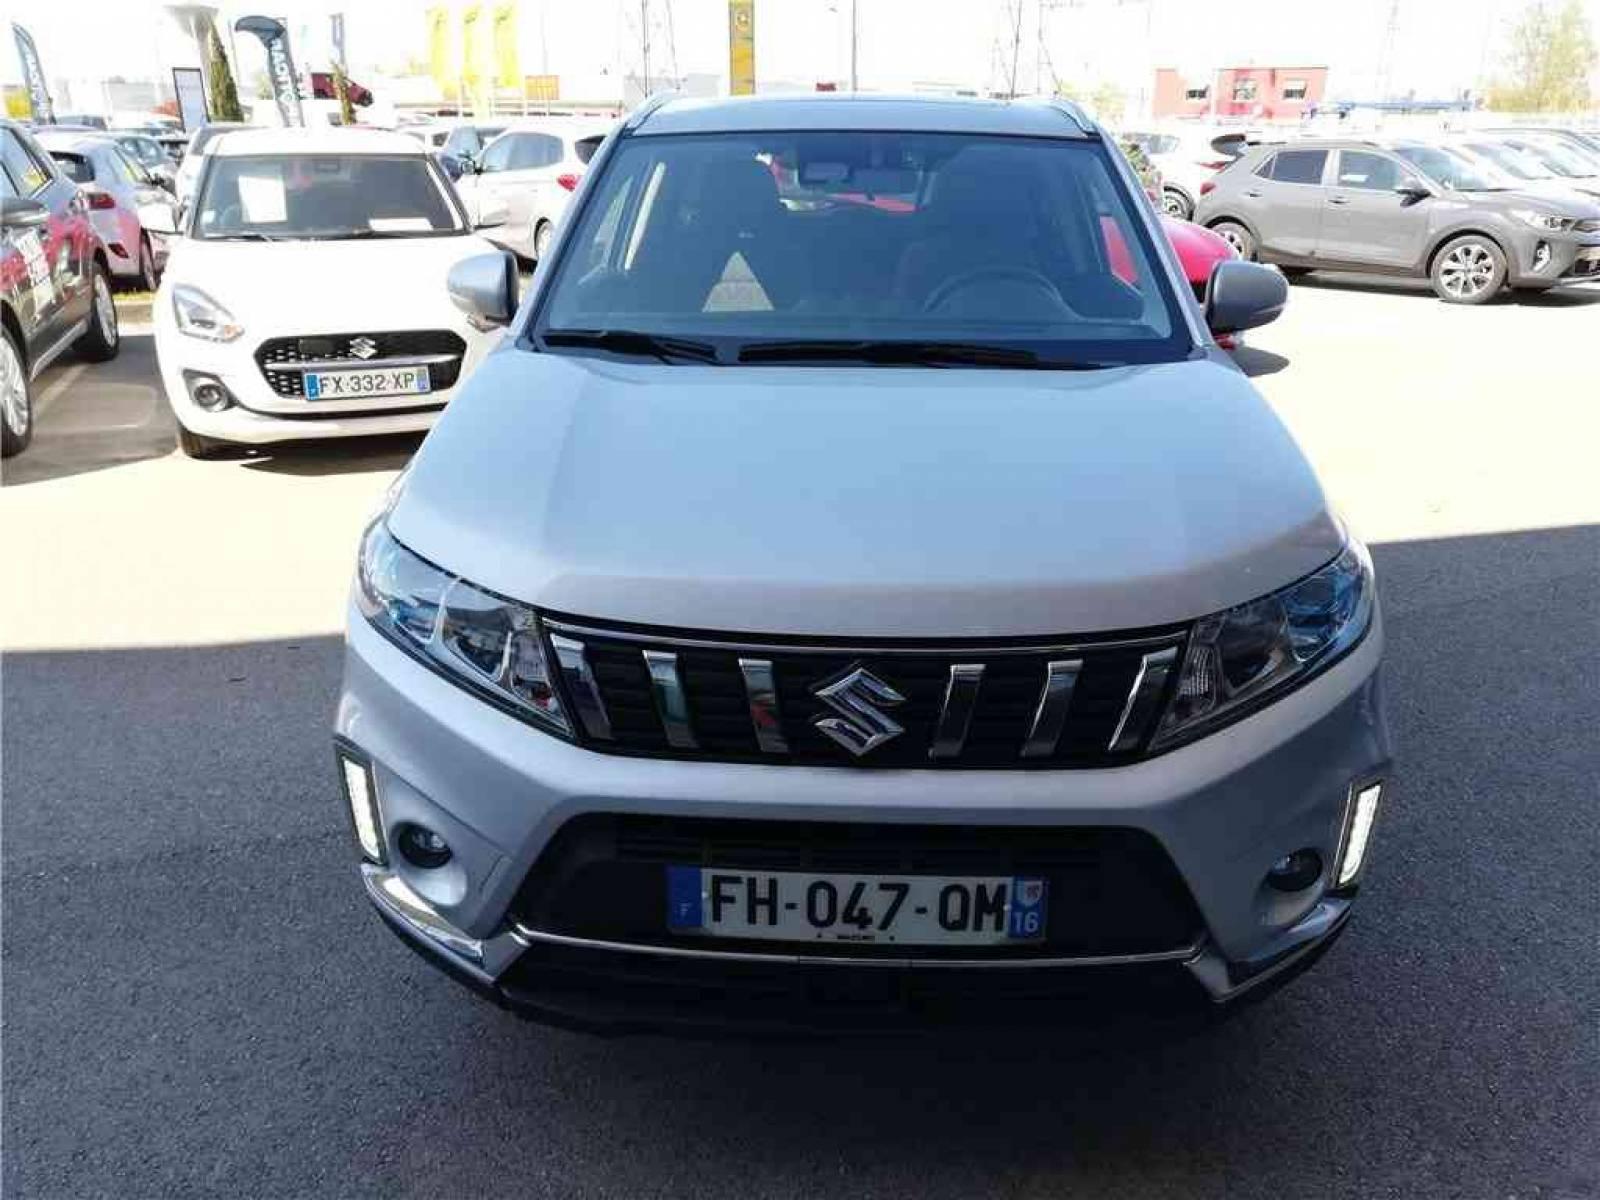 SUZUKI Vitara 1.0 Boosterjet - véhicule d'occasion - Groupe Guillet - Opel Magicauto - Chalon-sur-Saône - 71380 - Saint-Marcel - 36